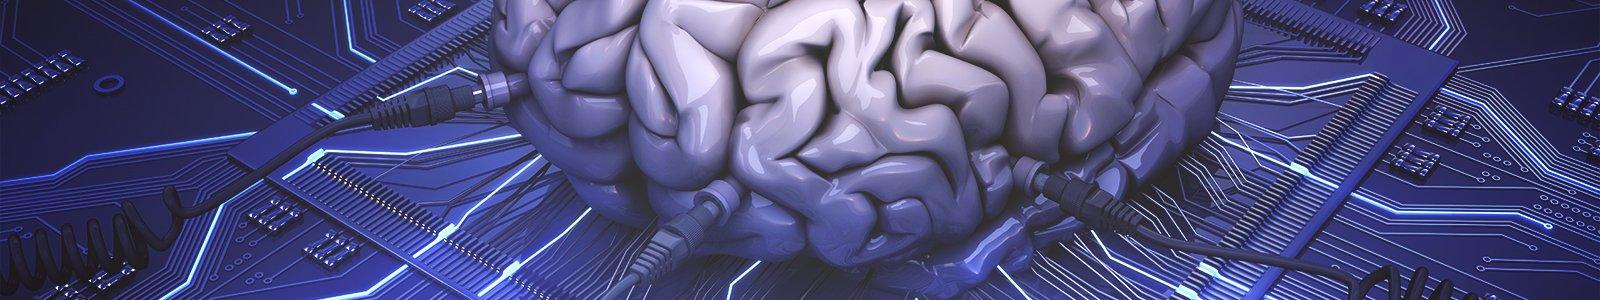 Brain © iStockphoto.com/Petrovich9